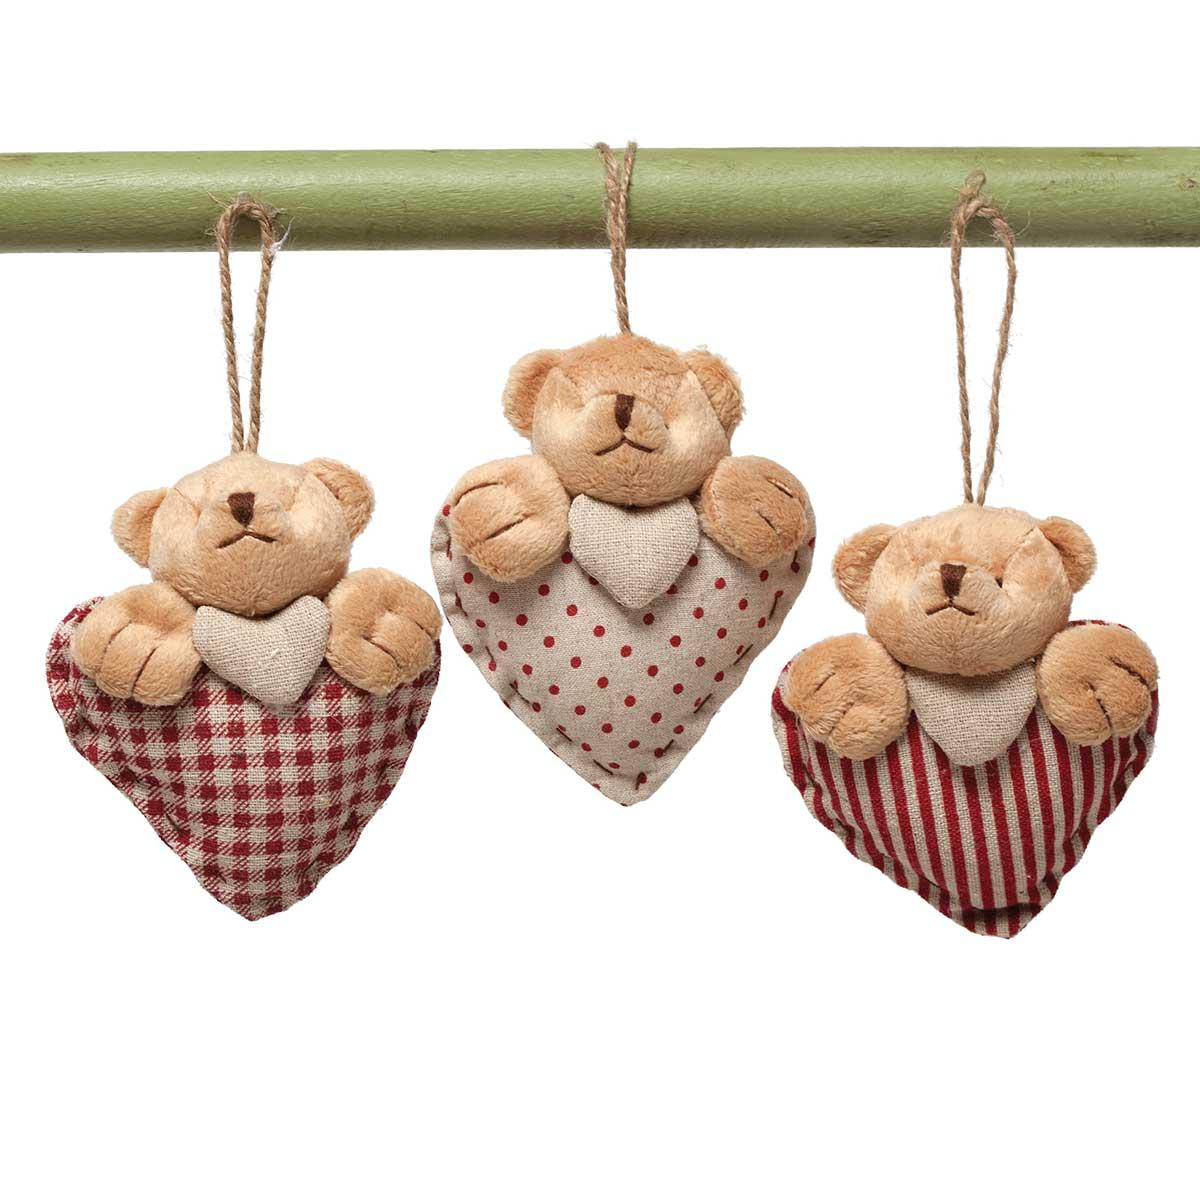 "COZY BEAR HEART ORNAMENT 4.5"" 3 ASSORTED"